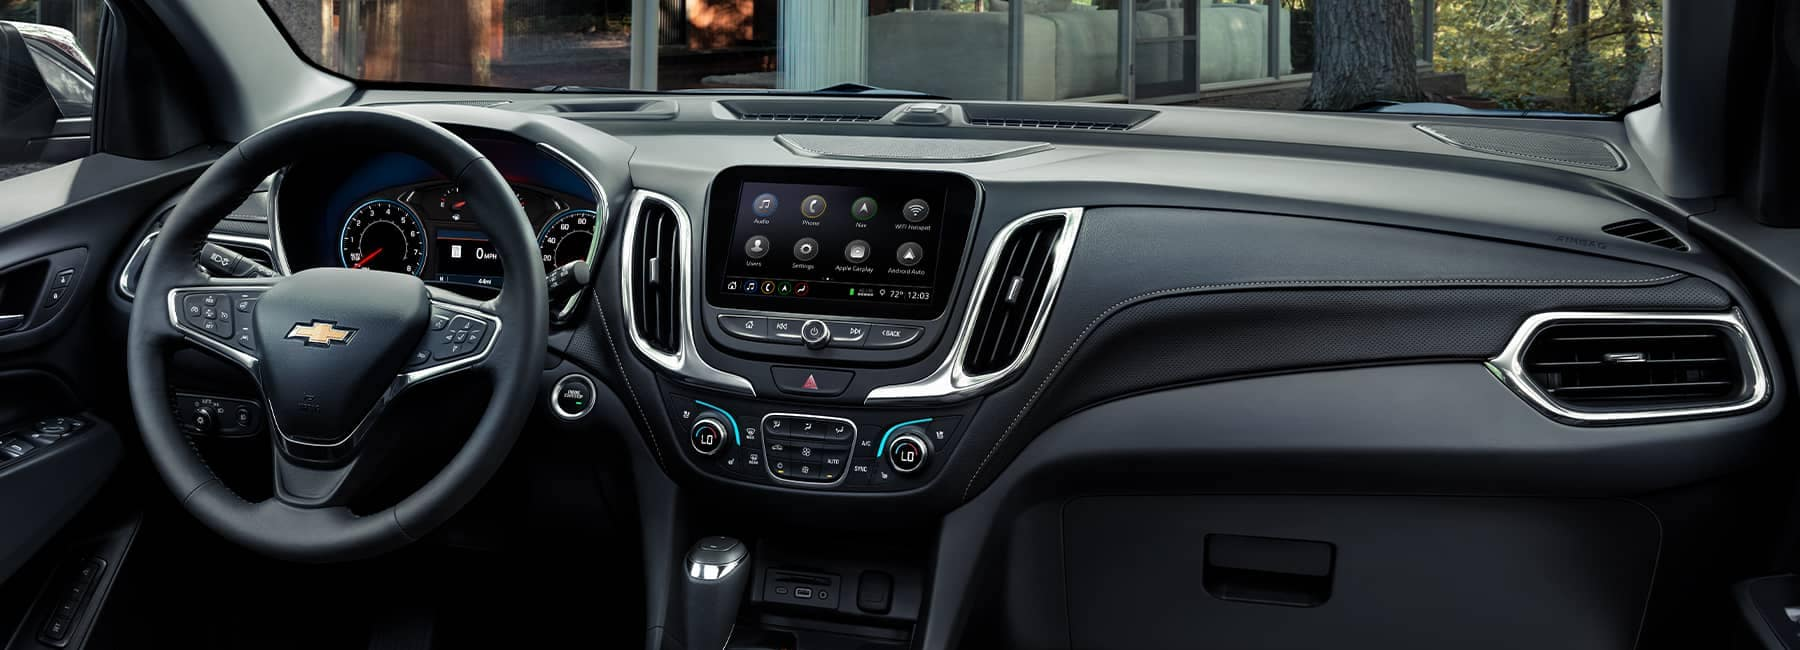 Interior dashboard of a 2021 Chevrolet Equinox